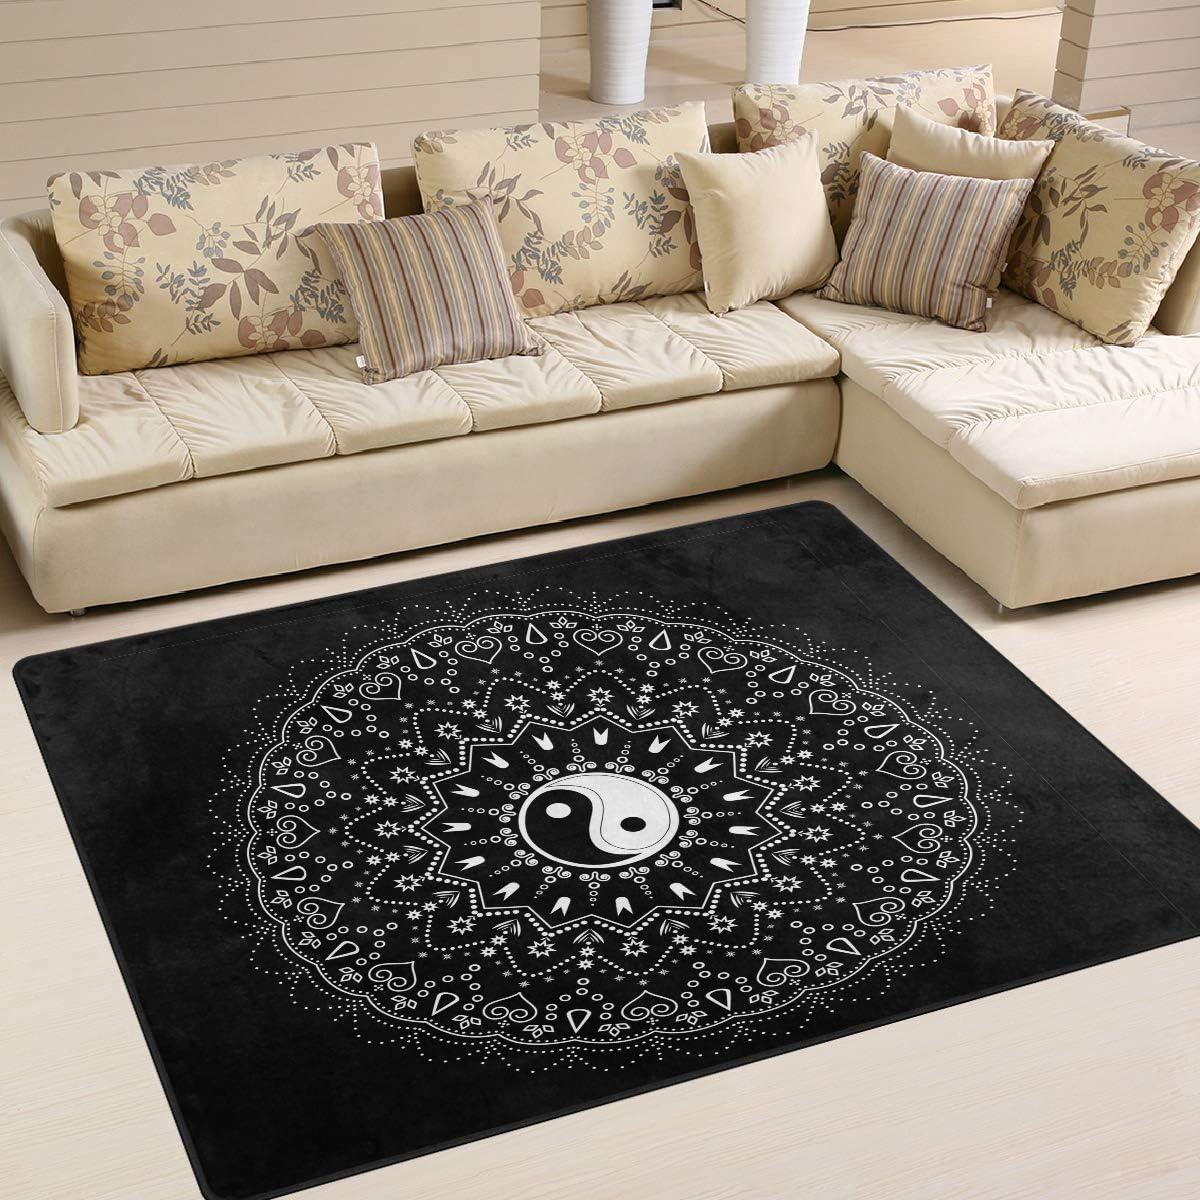 55% OFF ALAZA Indian Mandala Flower Yin Yang Rug Super-cheap Liv Area for Rugs Black